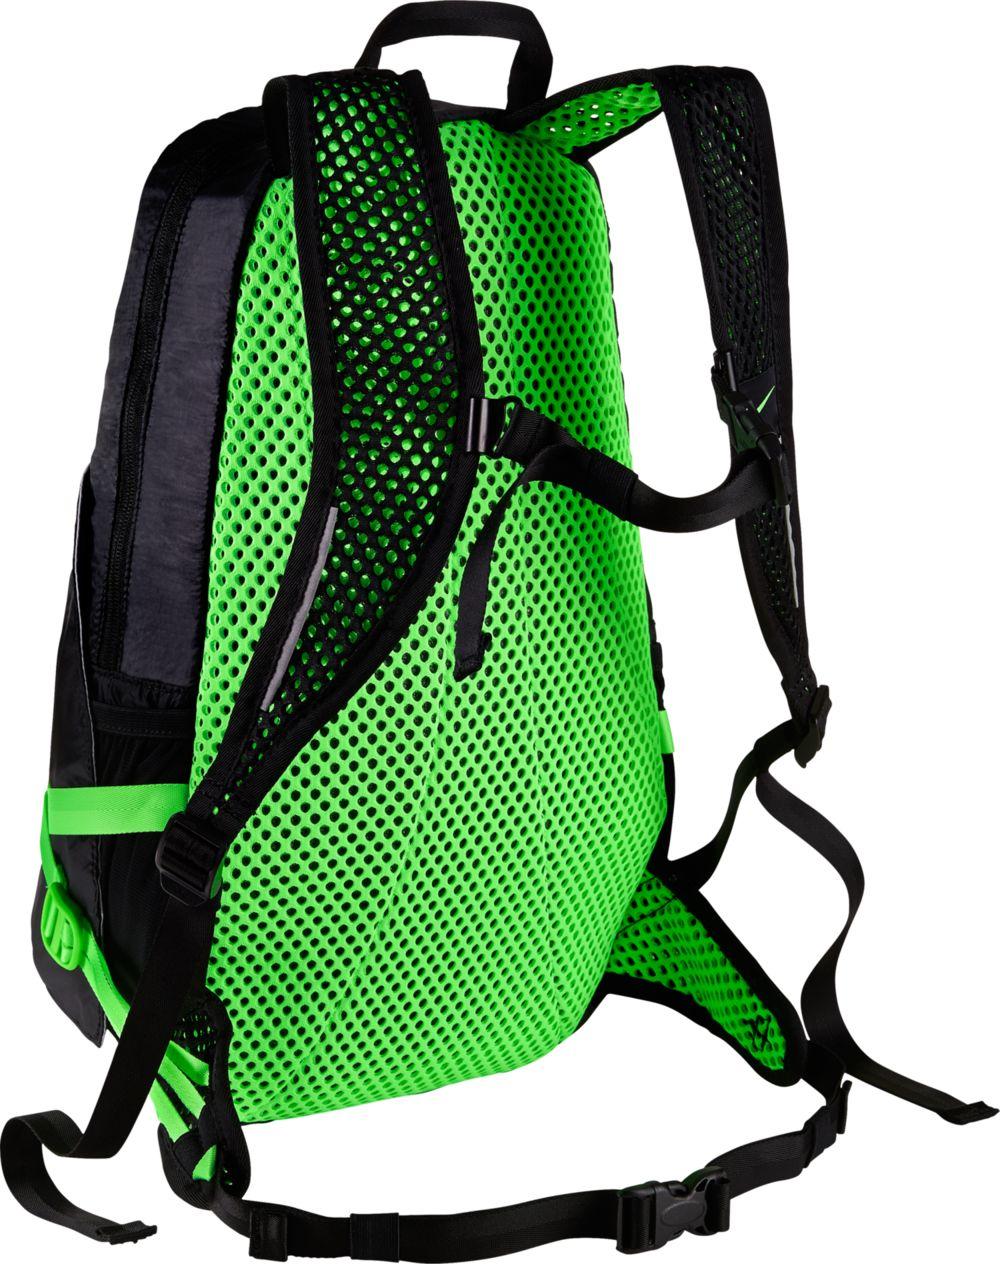 Nike Vapor Lite Backpack in Schwarz